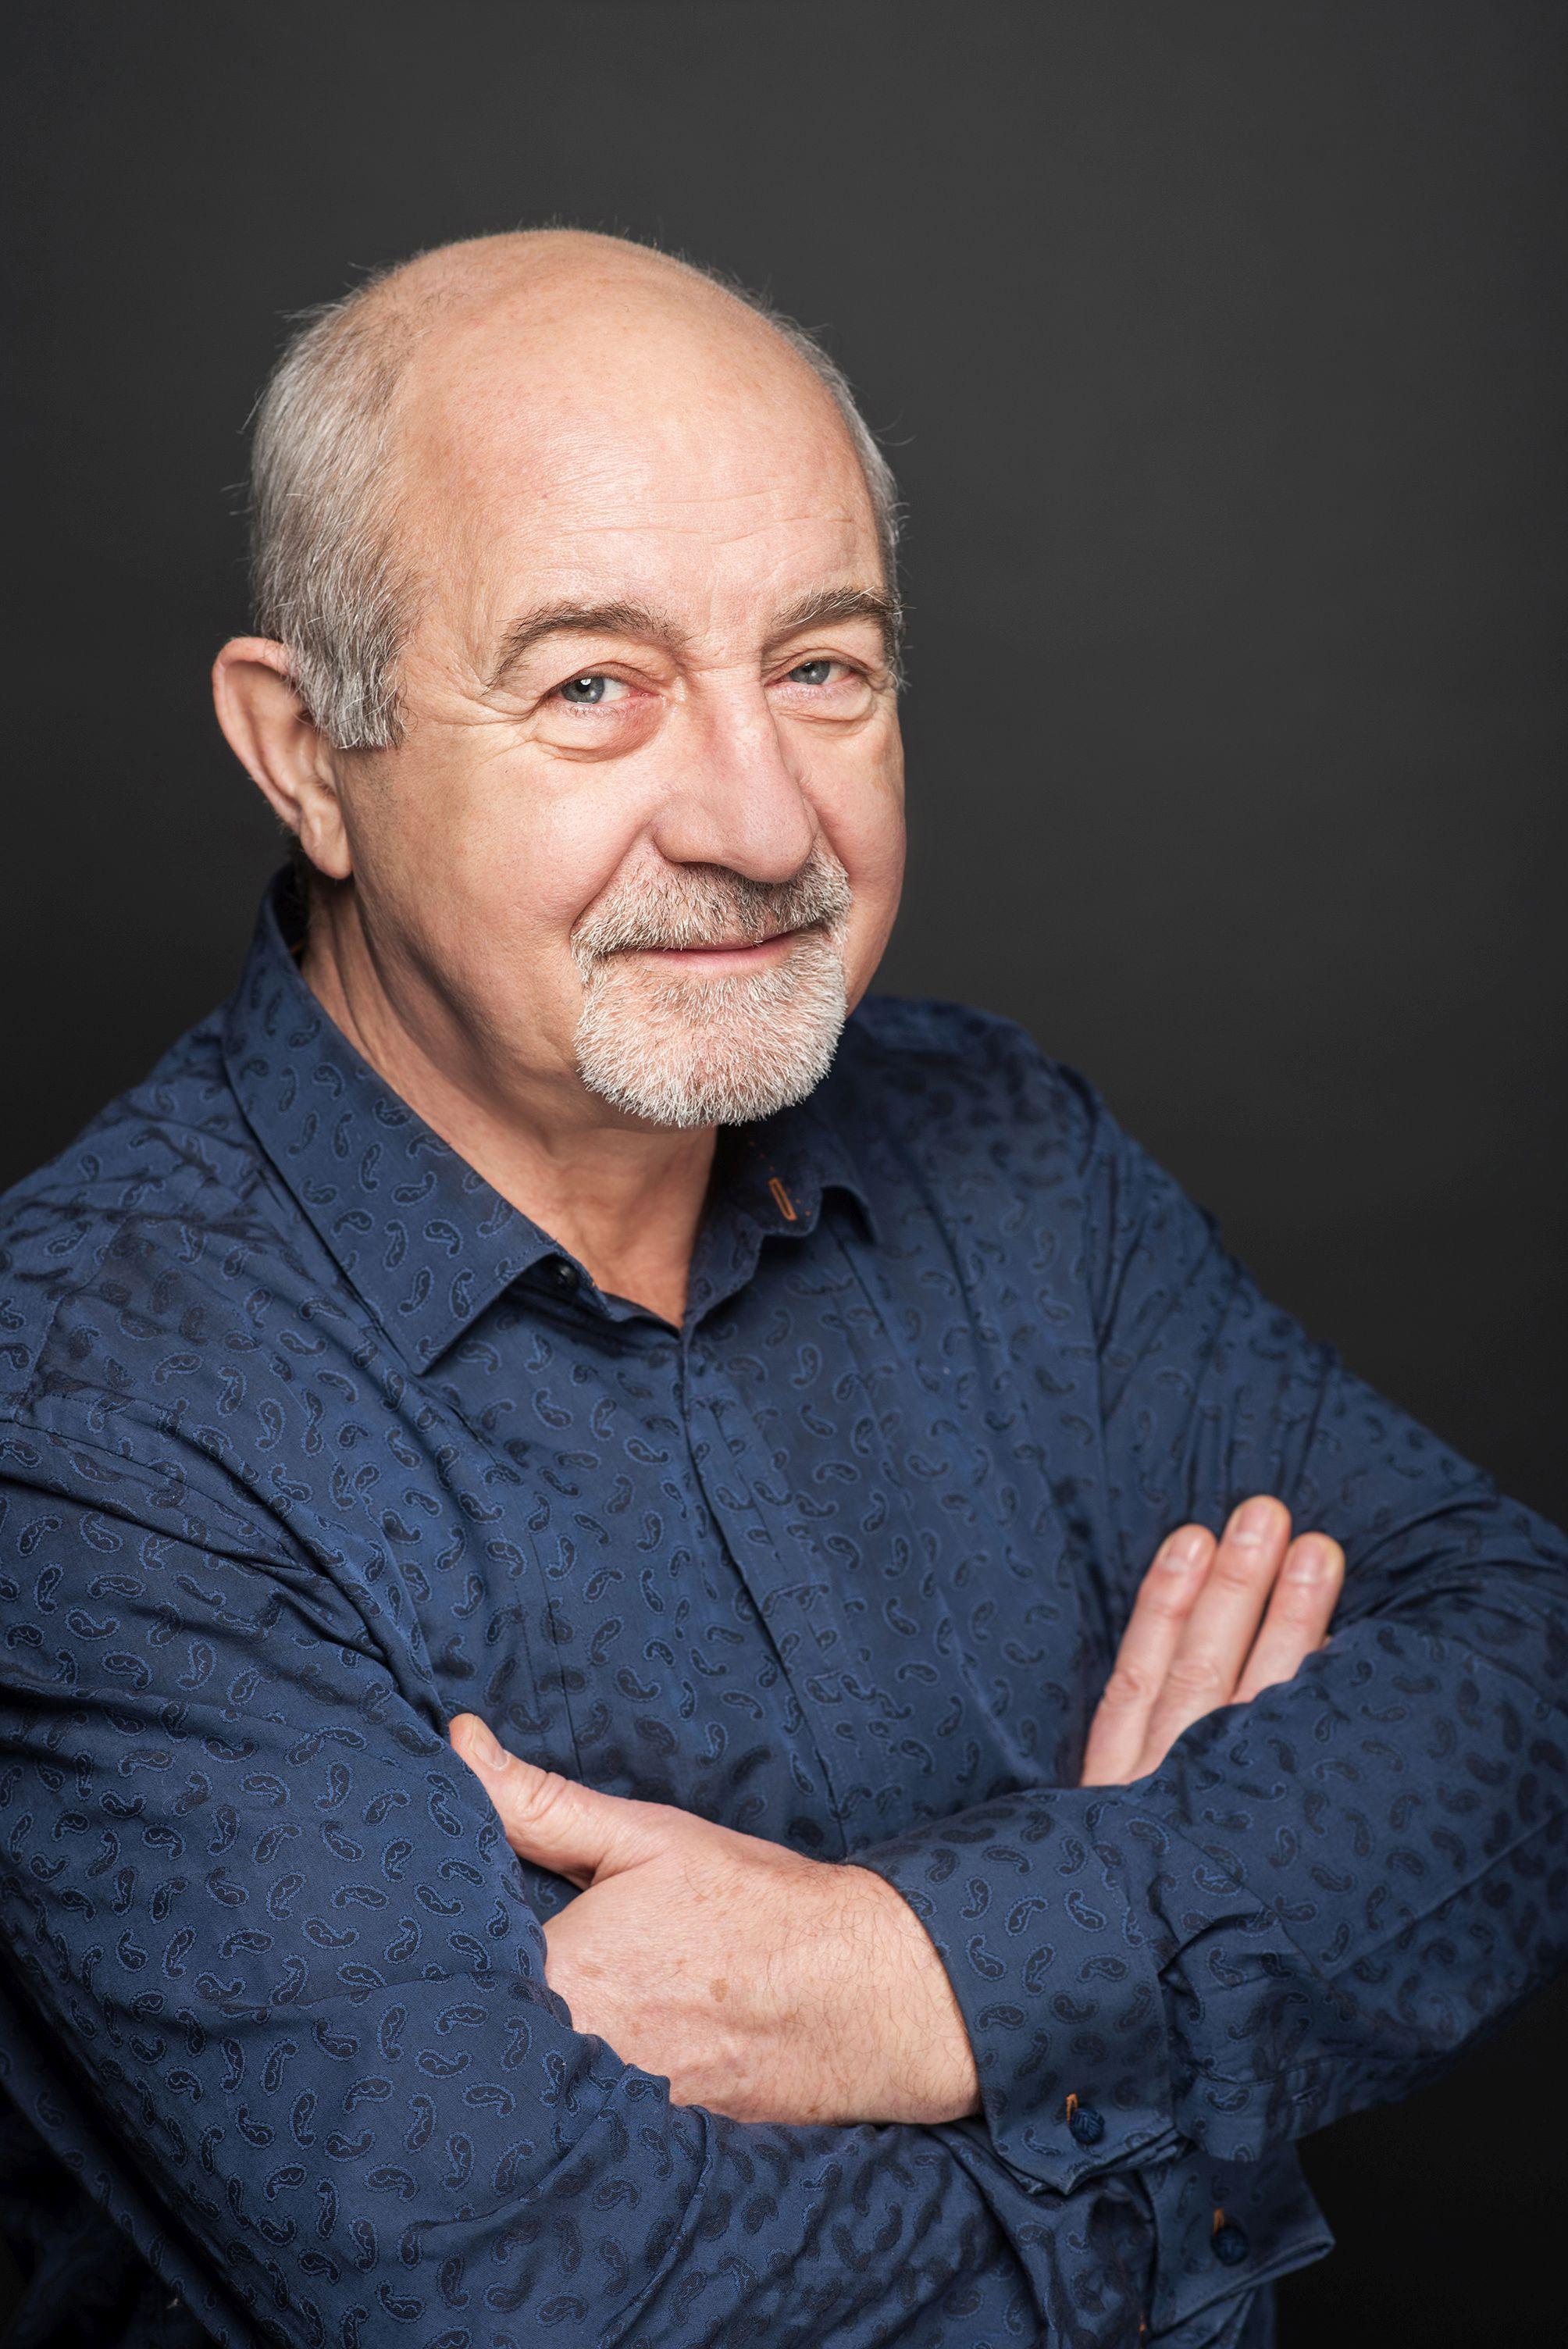 Romuald J. Kosznik